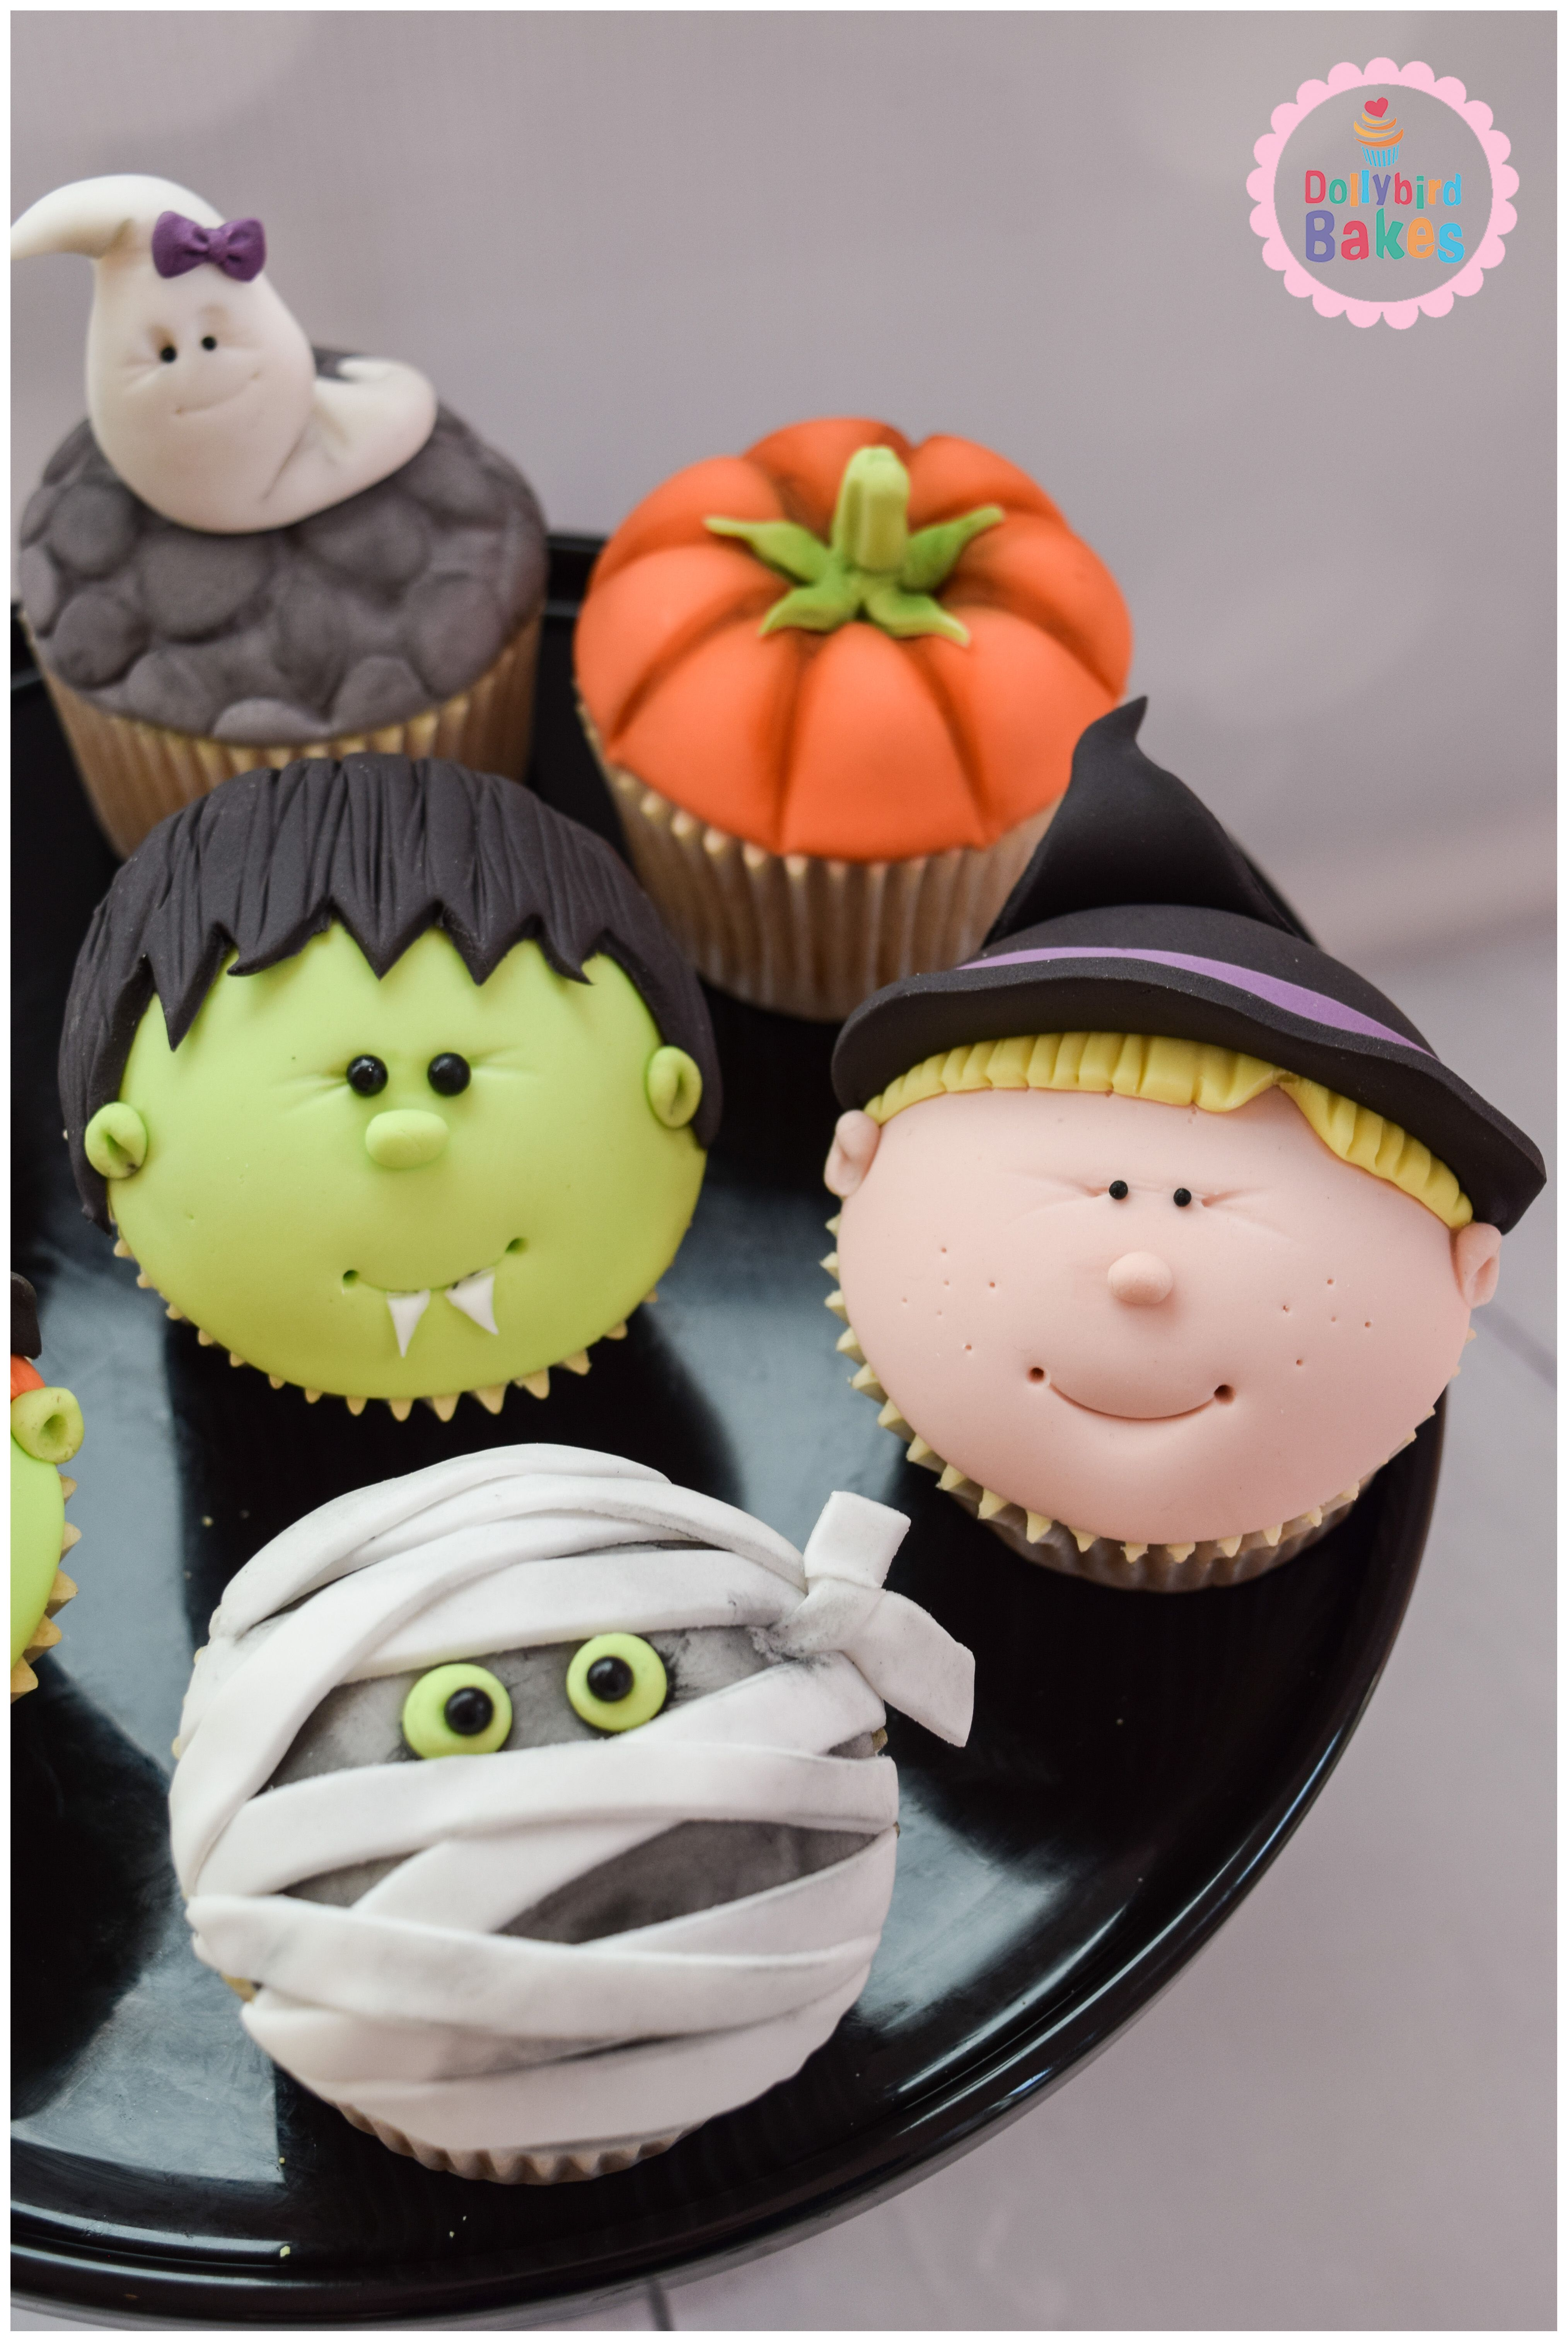 Celebration Cakes Gallery Dollybird Bakes Cornwall Halloween